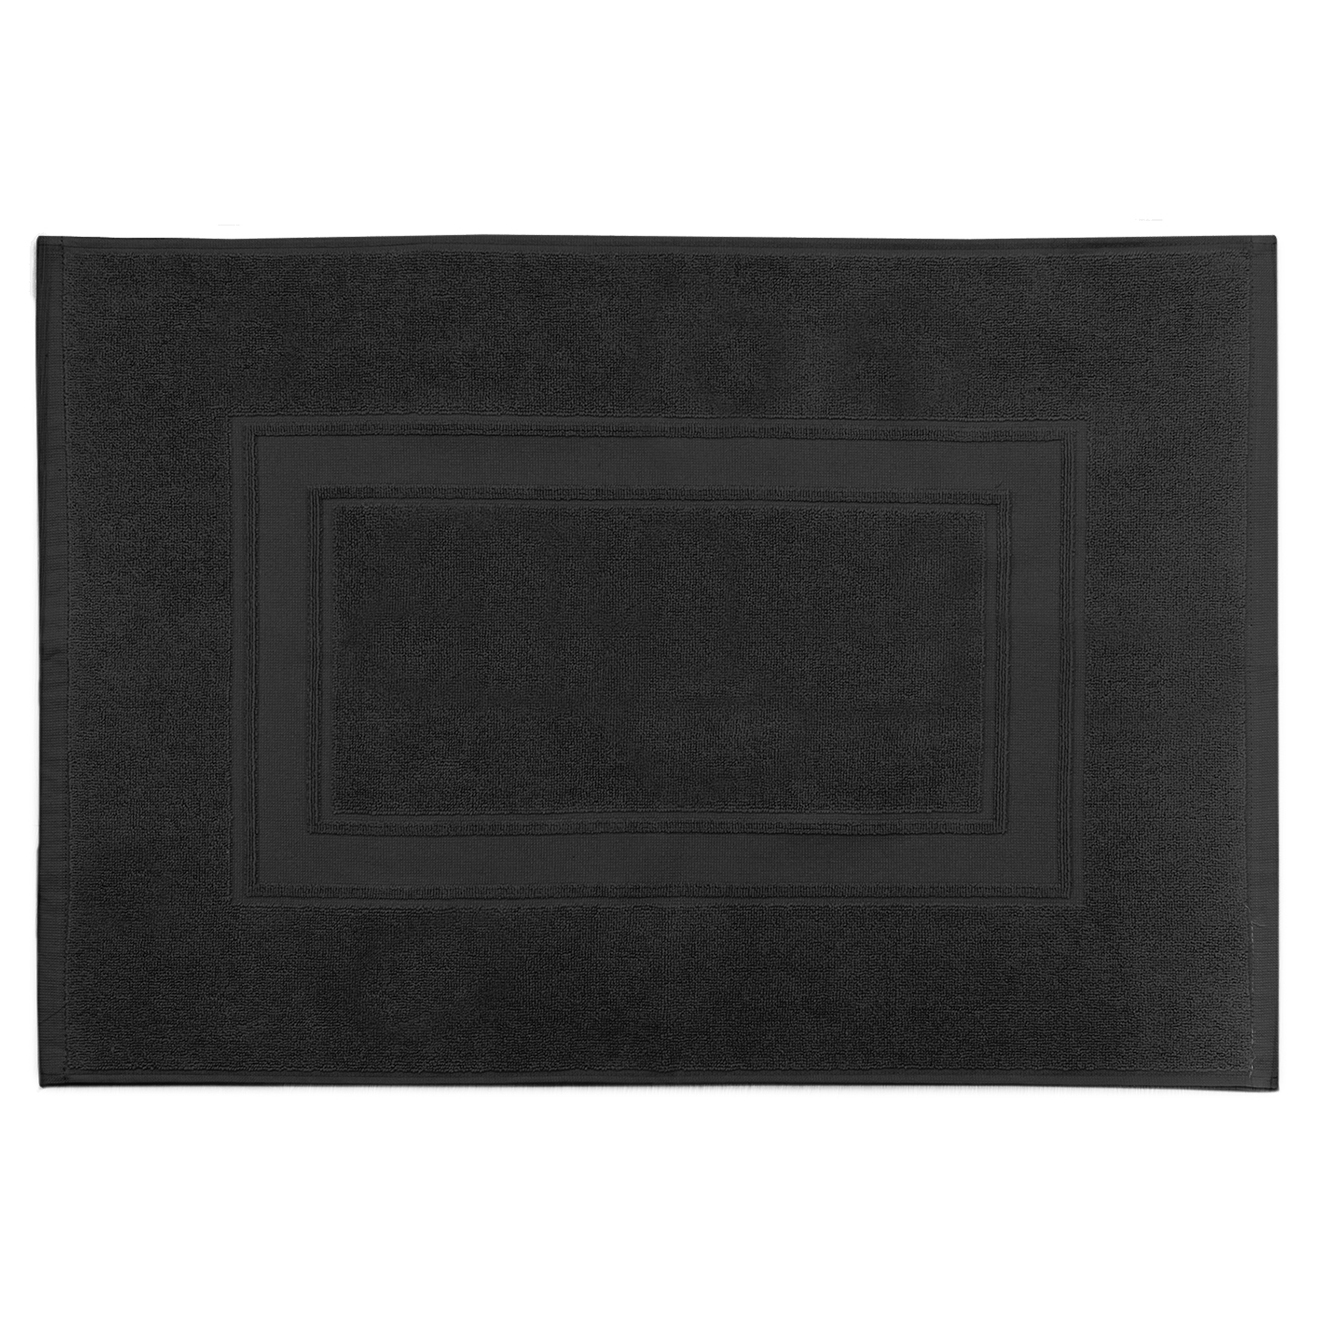 Tapis de bain Elisa noir - 50x70 cm